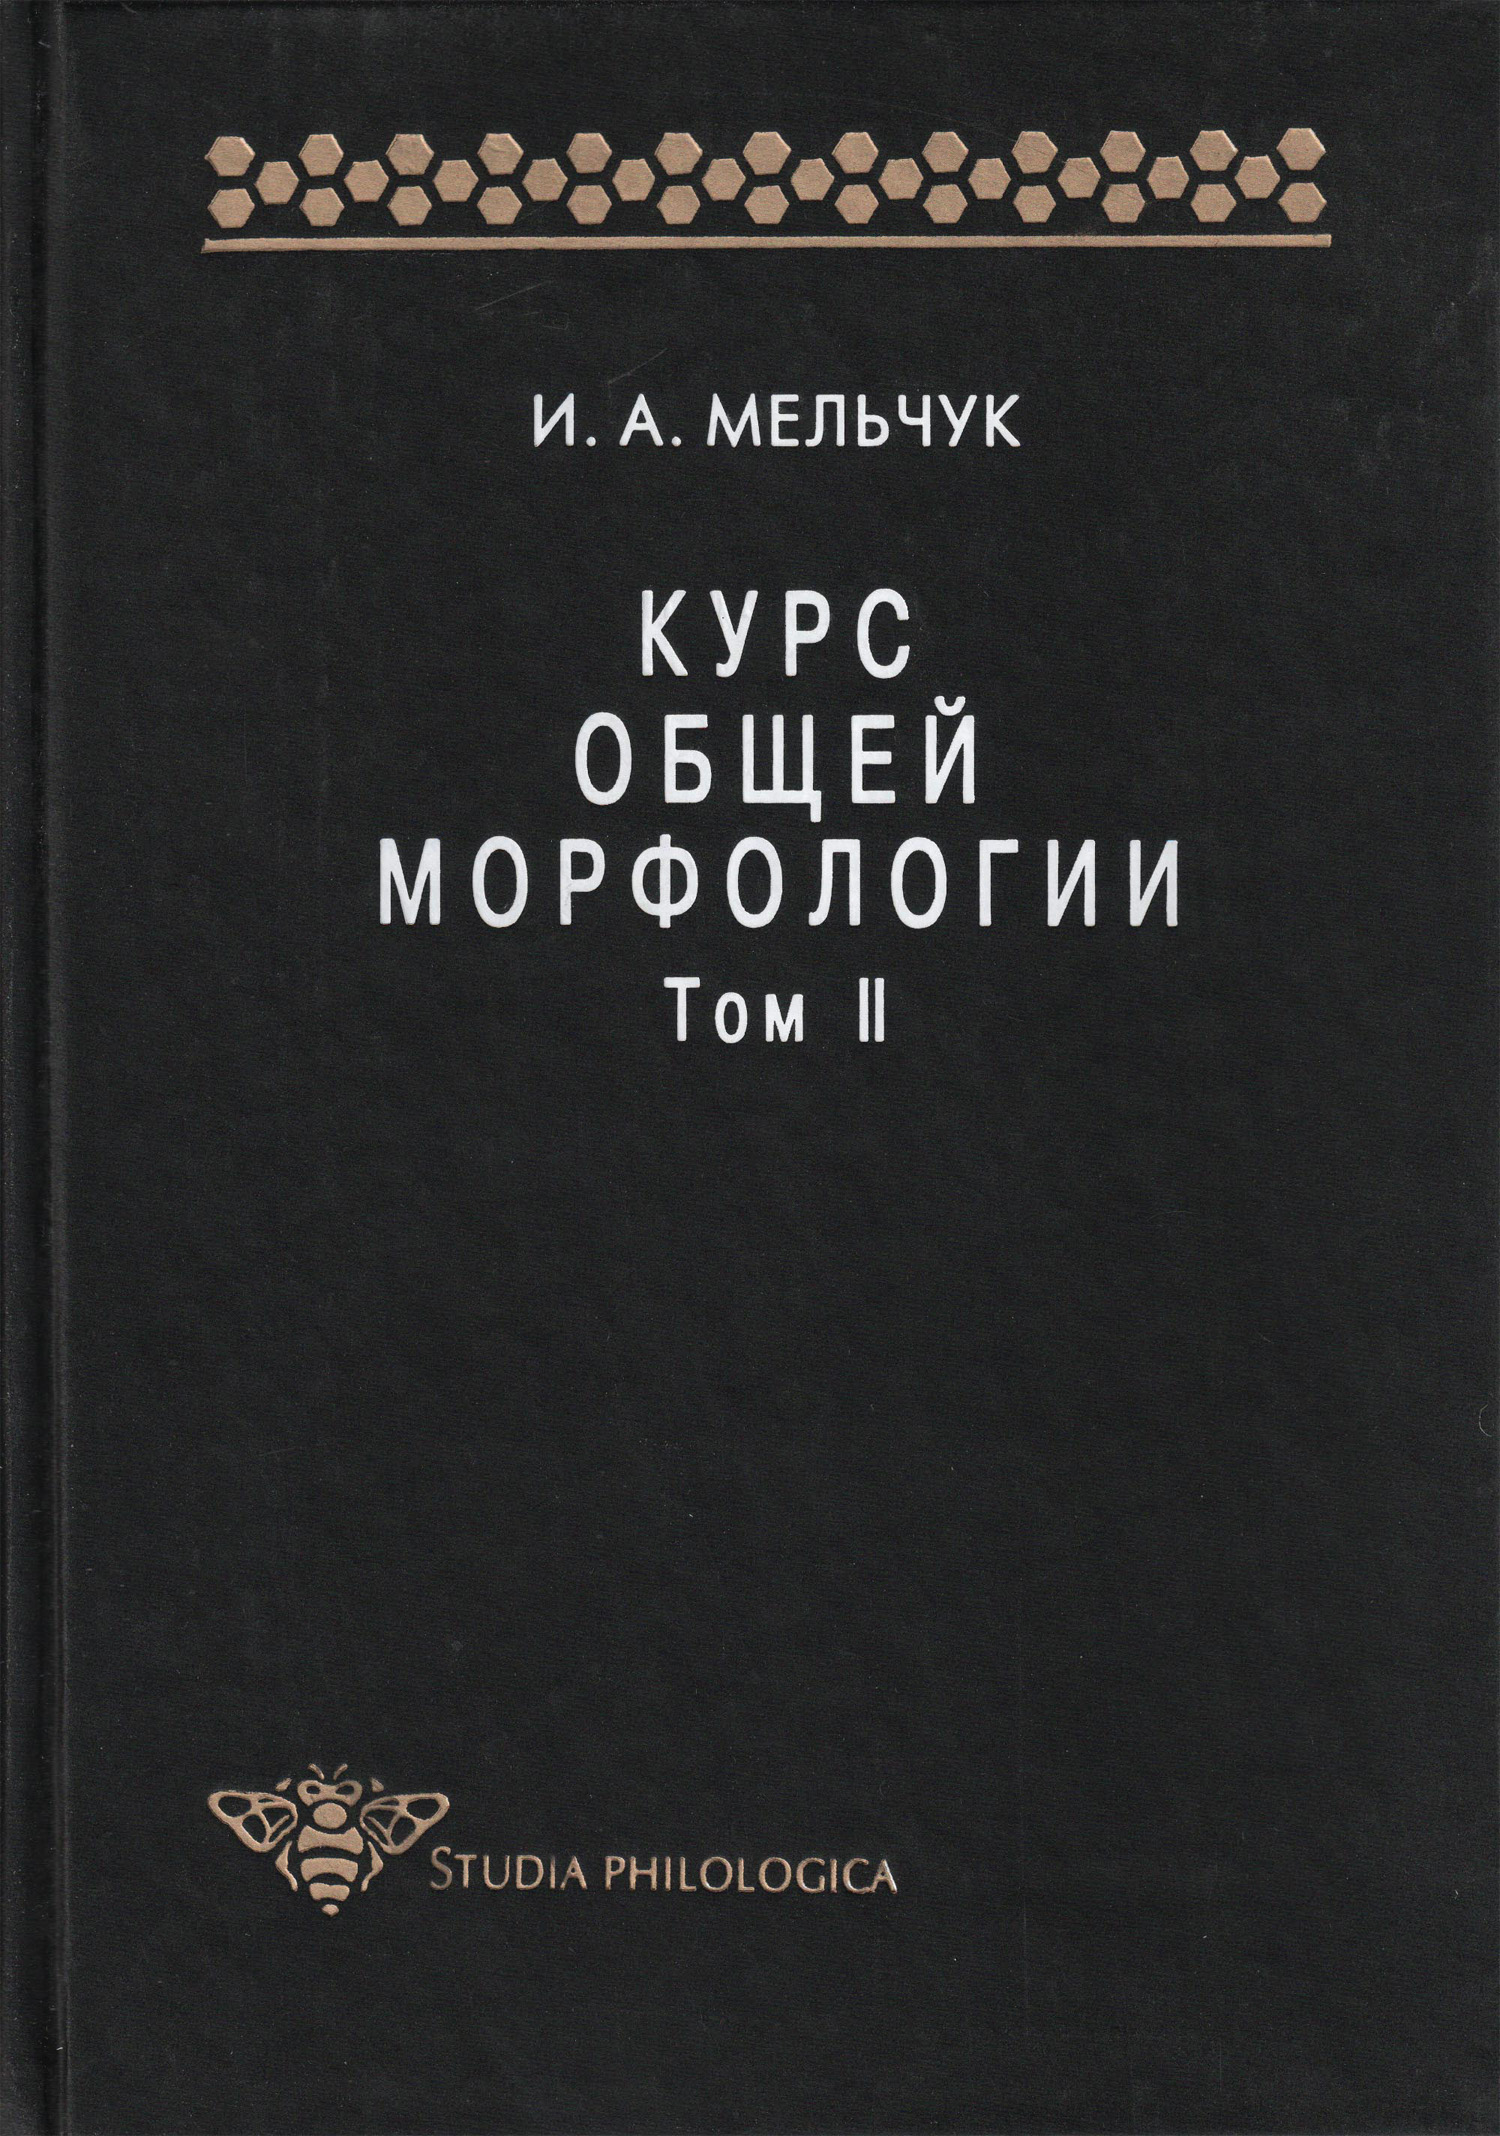 Курс общей морфологии. Том II